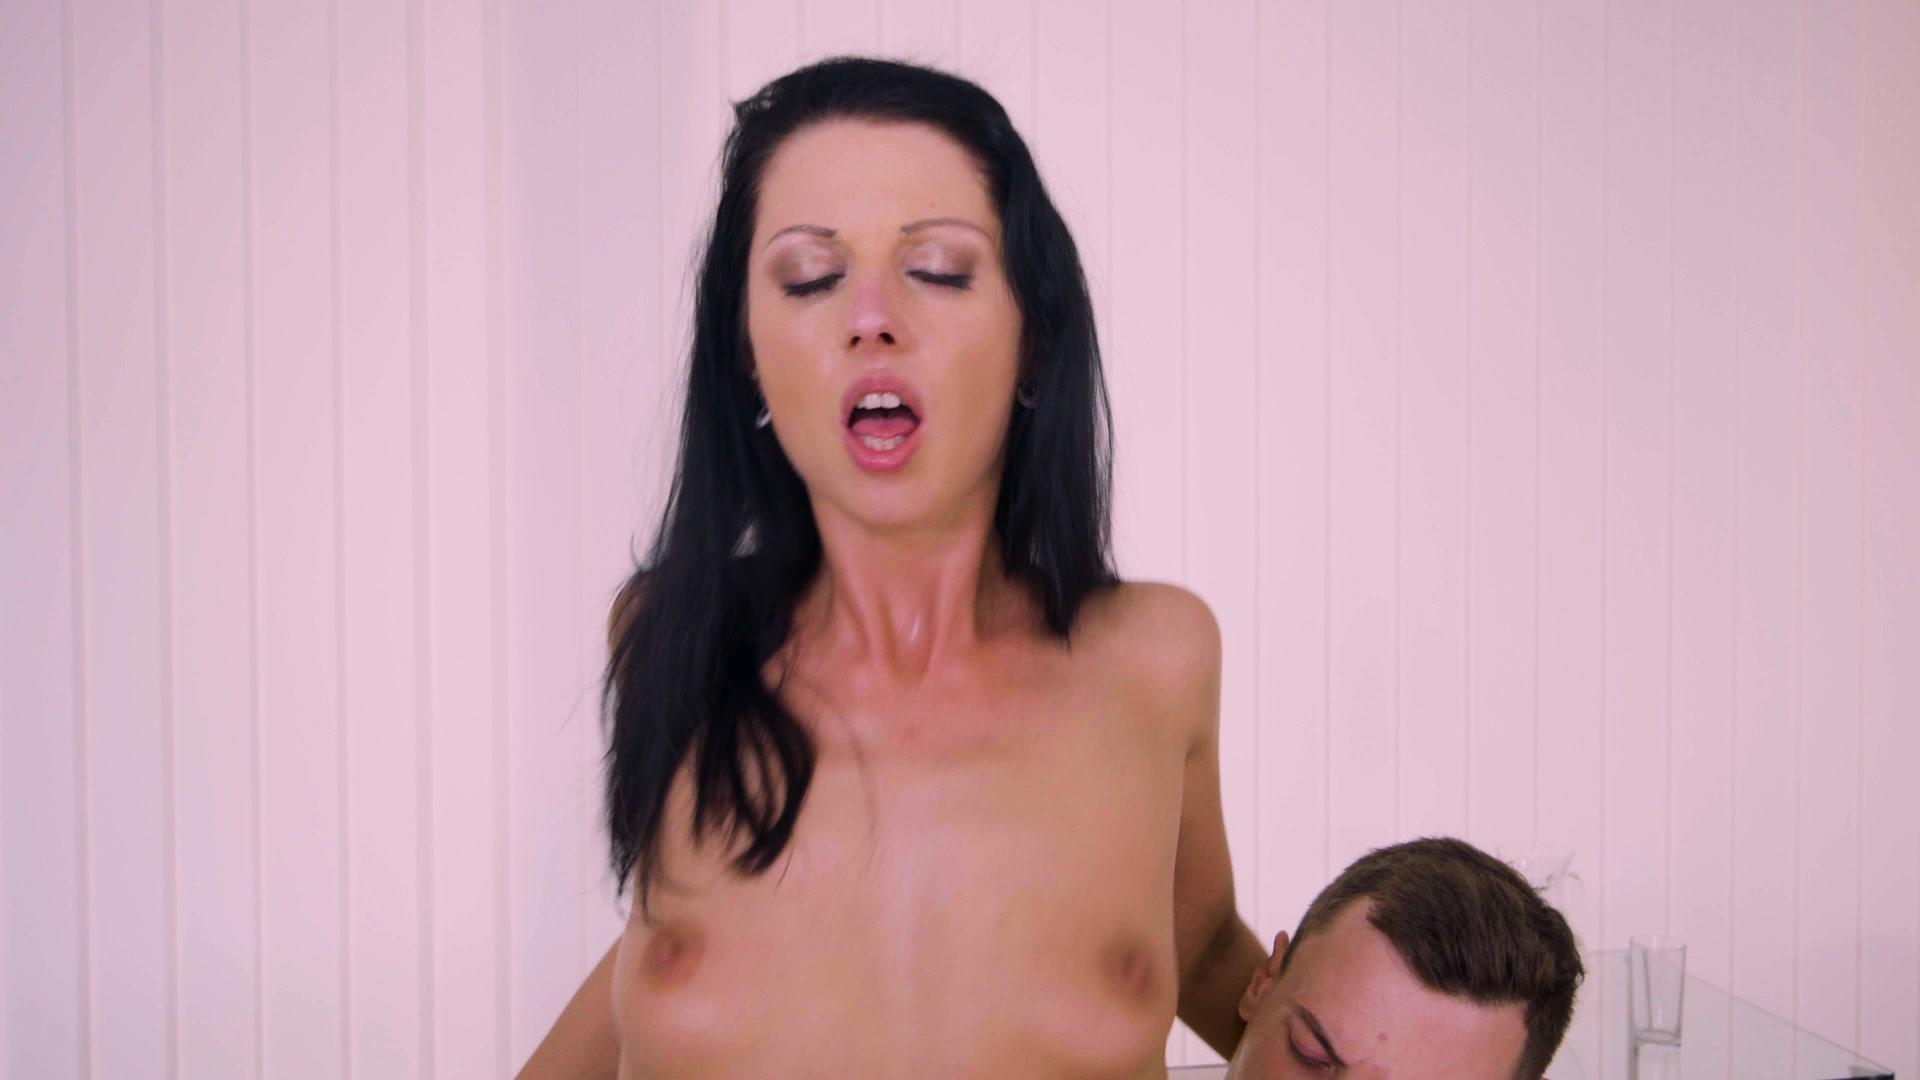 Switch place a milf video preview titssssssssss lady